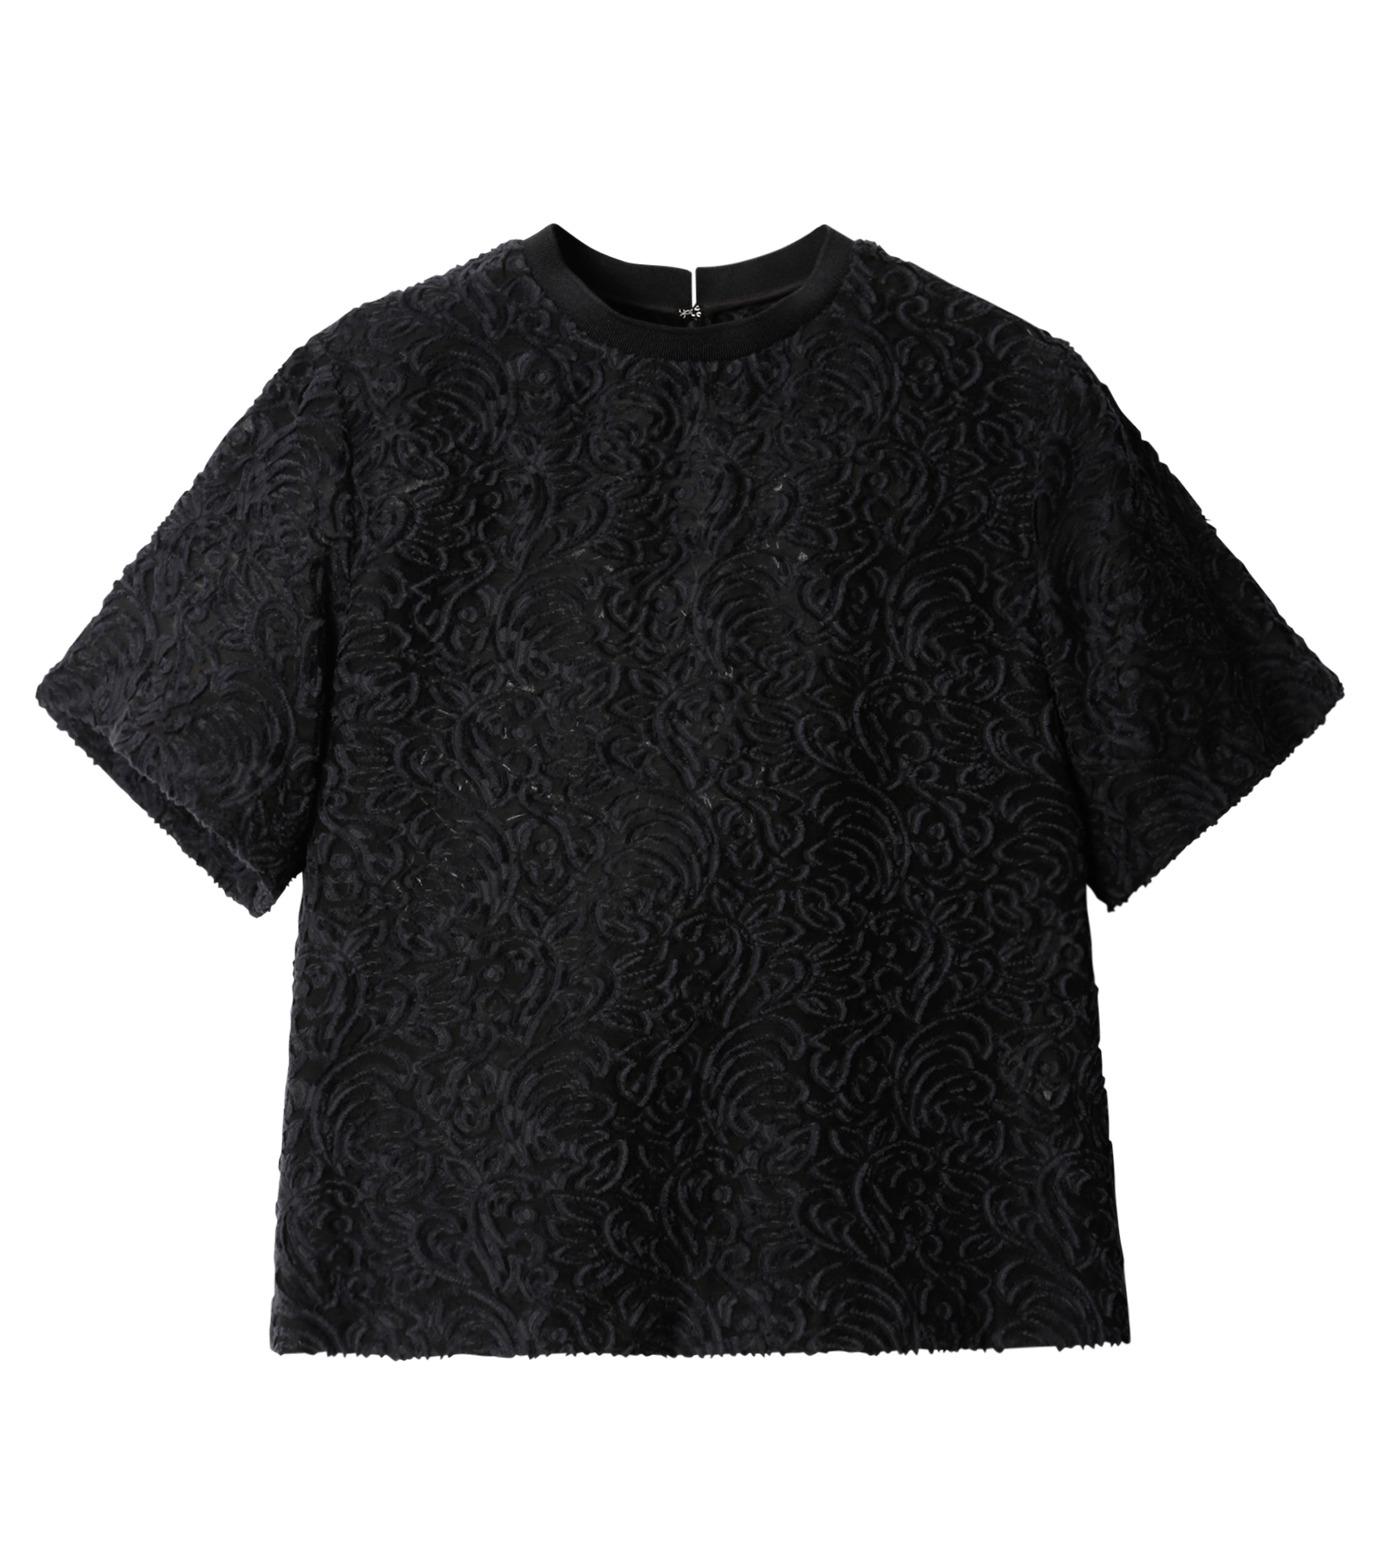 LE CIEL BLEU(ルシェルブルー)のカットジャガードトップス-BLACK(シャツ/shirt)-18A63001 拡大詳細画像5